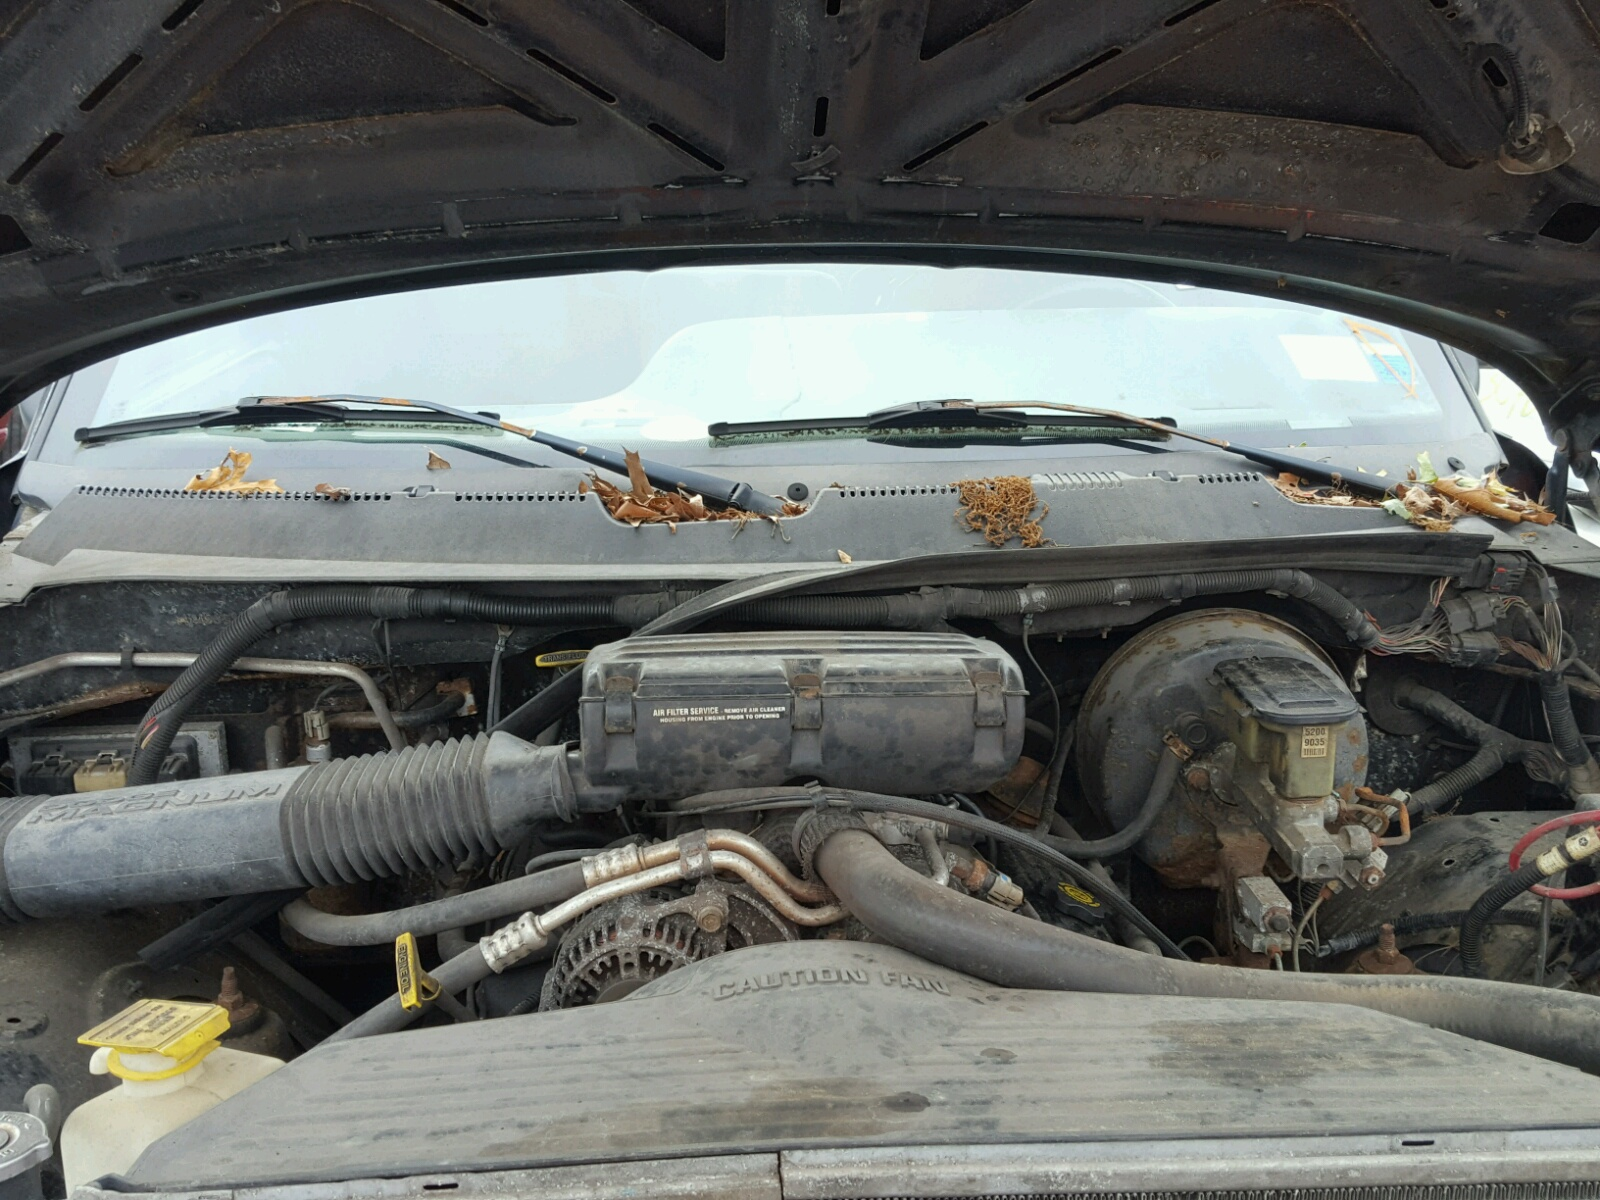 3b7hf13z8vm599283 1997 Black Dodge Ram 1500 On Sale In Ny Long Fuel Filter Location 59l Inside View